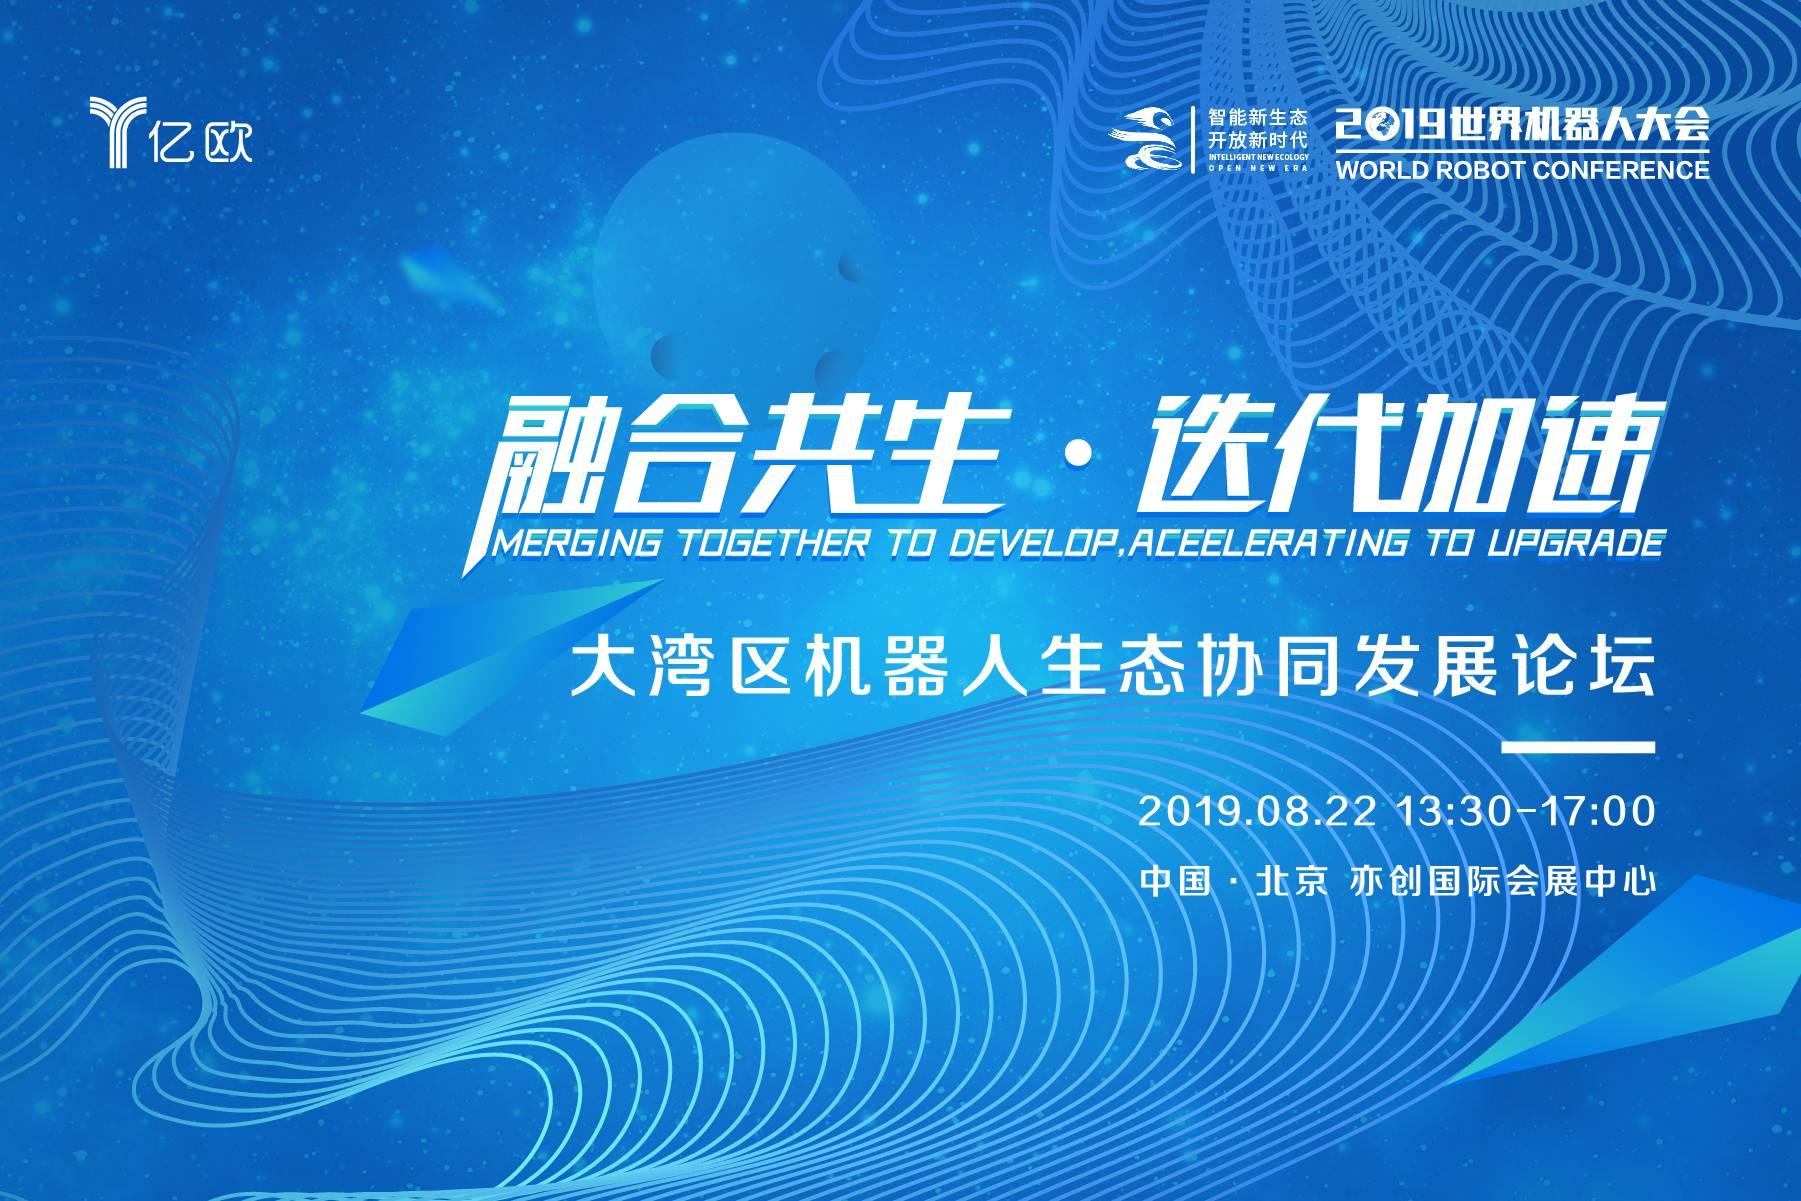 2019WRC丨大湾区机器人生态协同发展论坛成功举办